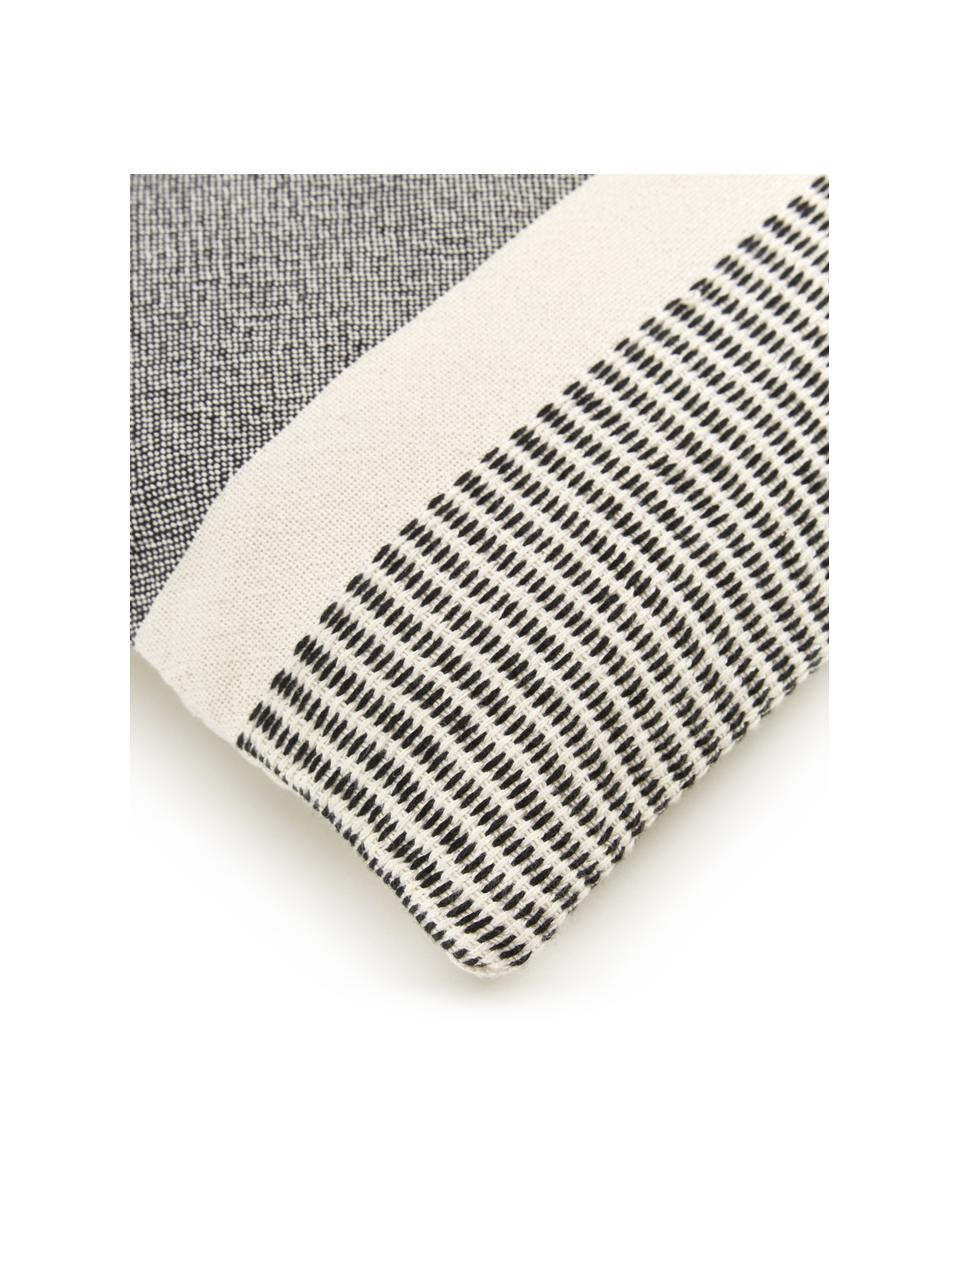 Gestreifte Kissenhülle Lines aus recyceltem Polyester, 100% Recyceltes Polyester, Schwarz, Weiß, 45 x 45 cm